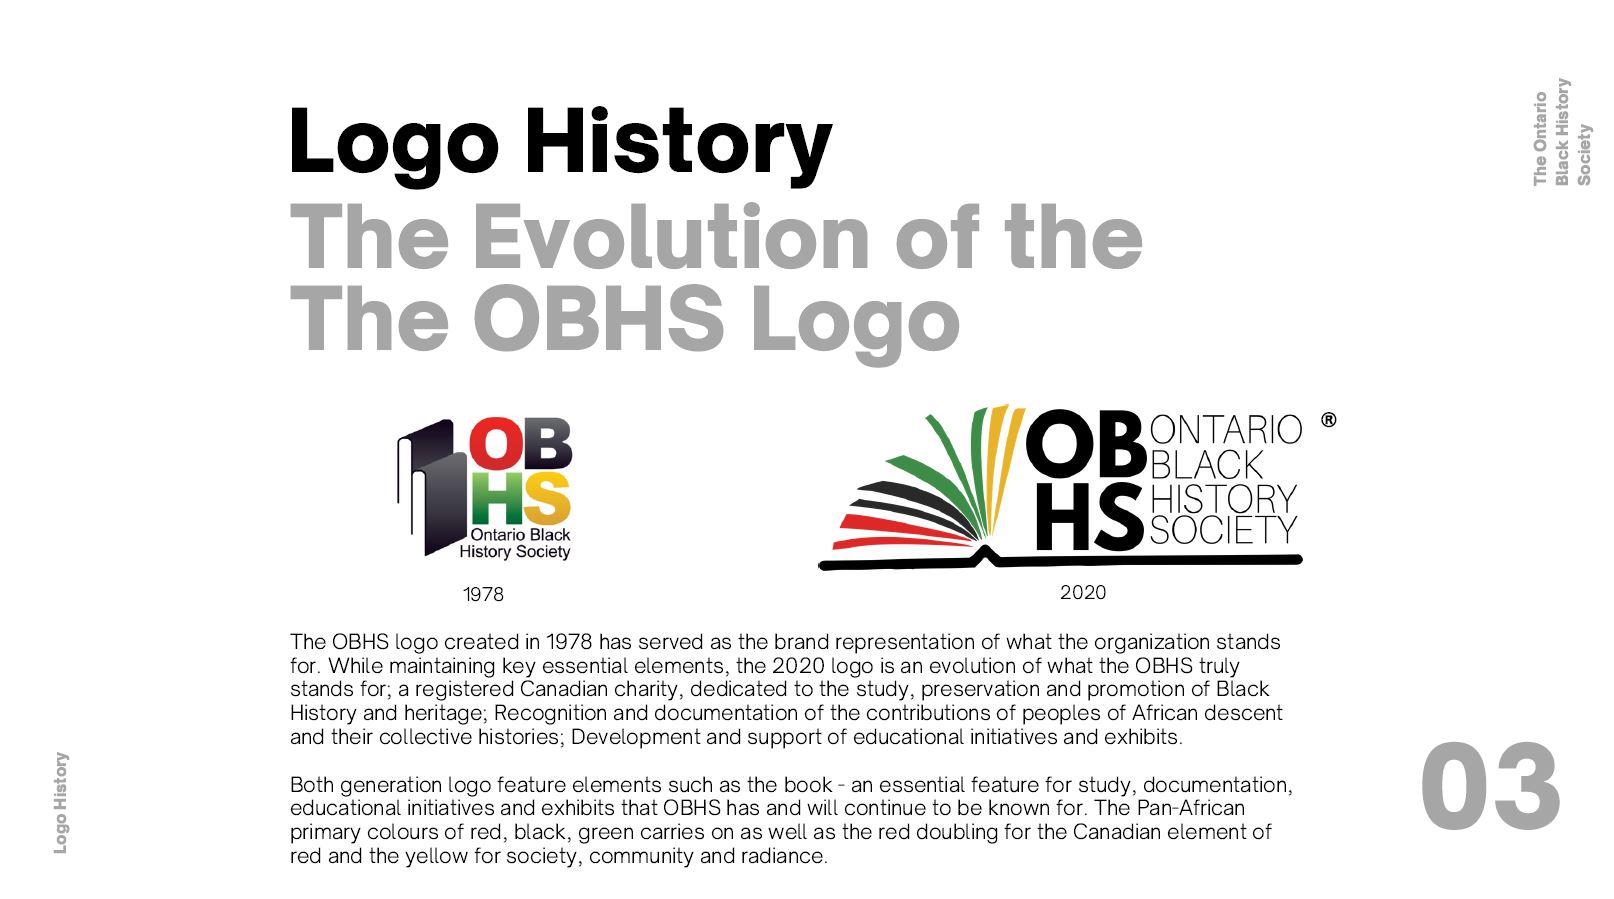 Ontario Black History Society Rebranding// Full Project here: https://www.canva.com/design/DAEIfKy5L6I/UqSmG78rYQqjPRy4MICjbg/view?utm_content=DAEIfKy5L6I&utm_campaign=designshare&utm_medium=link&utm_source=publishsharelink